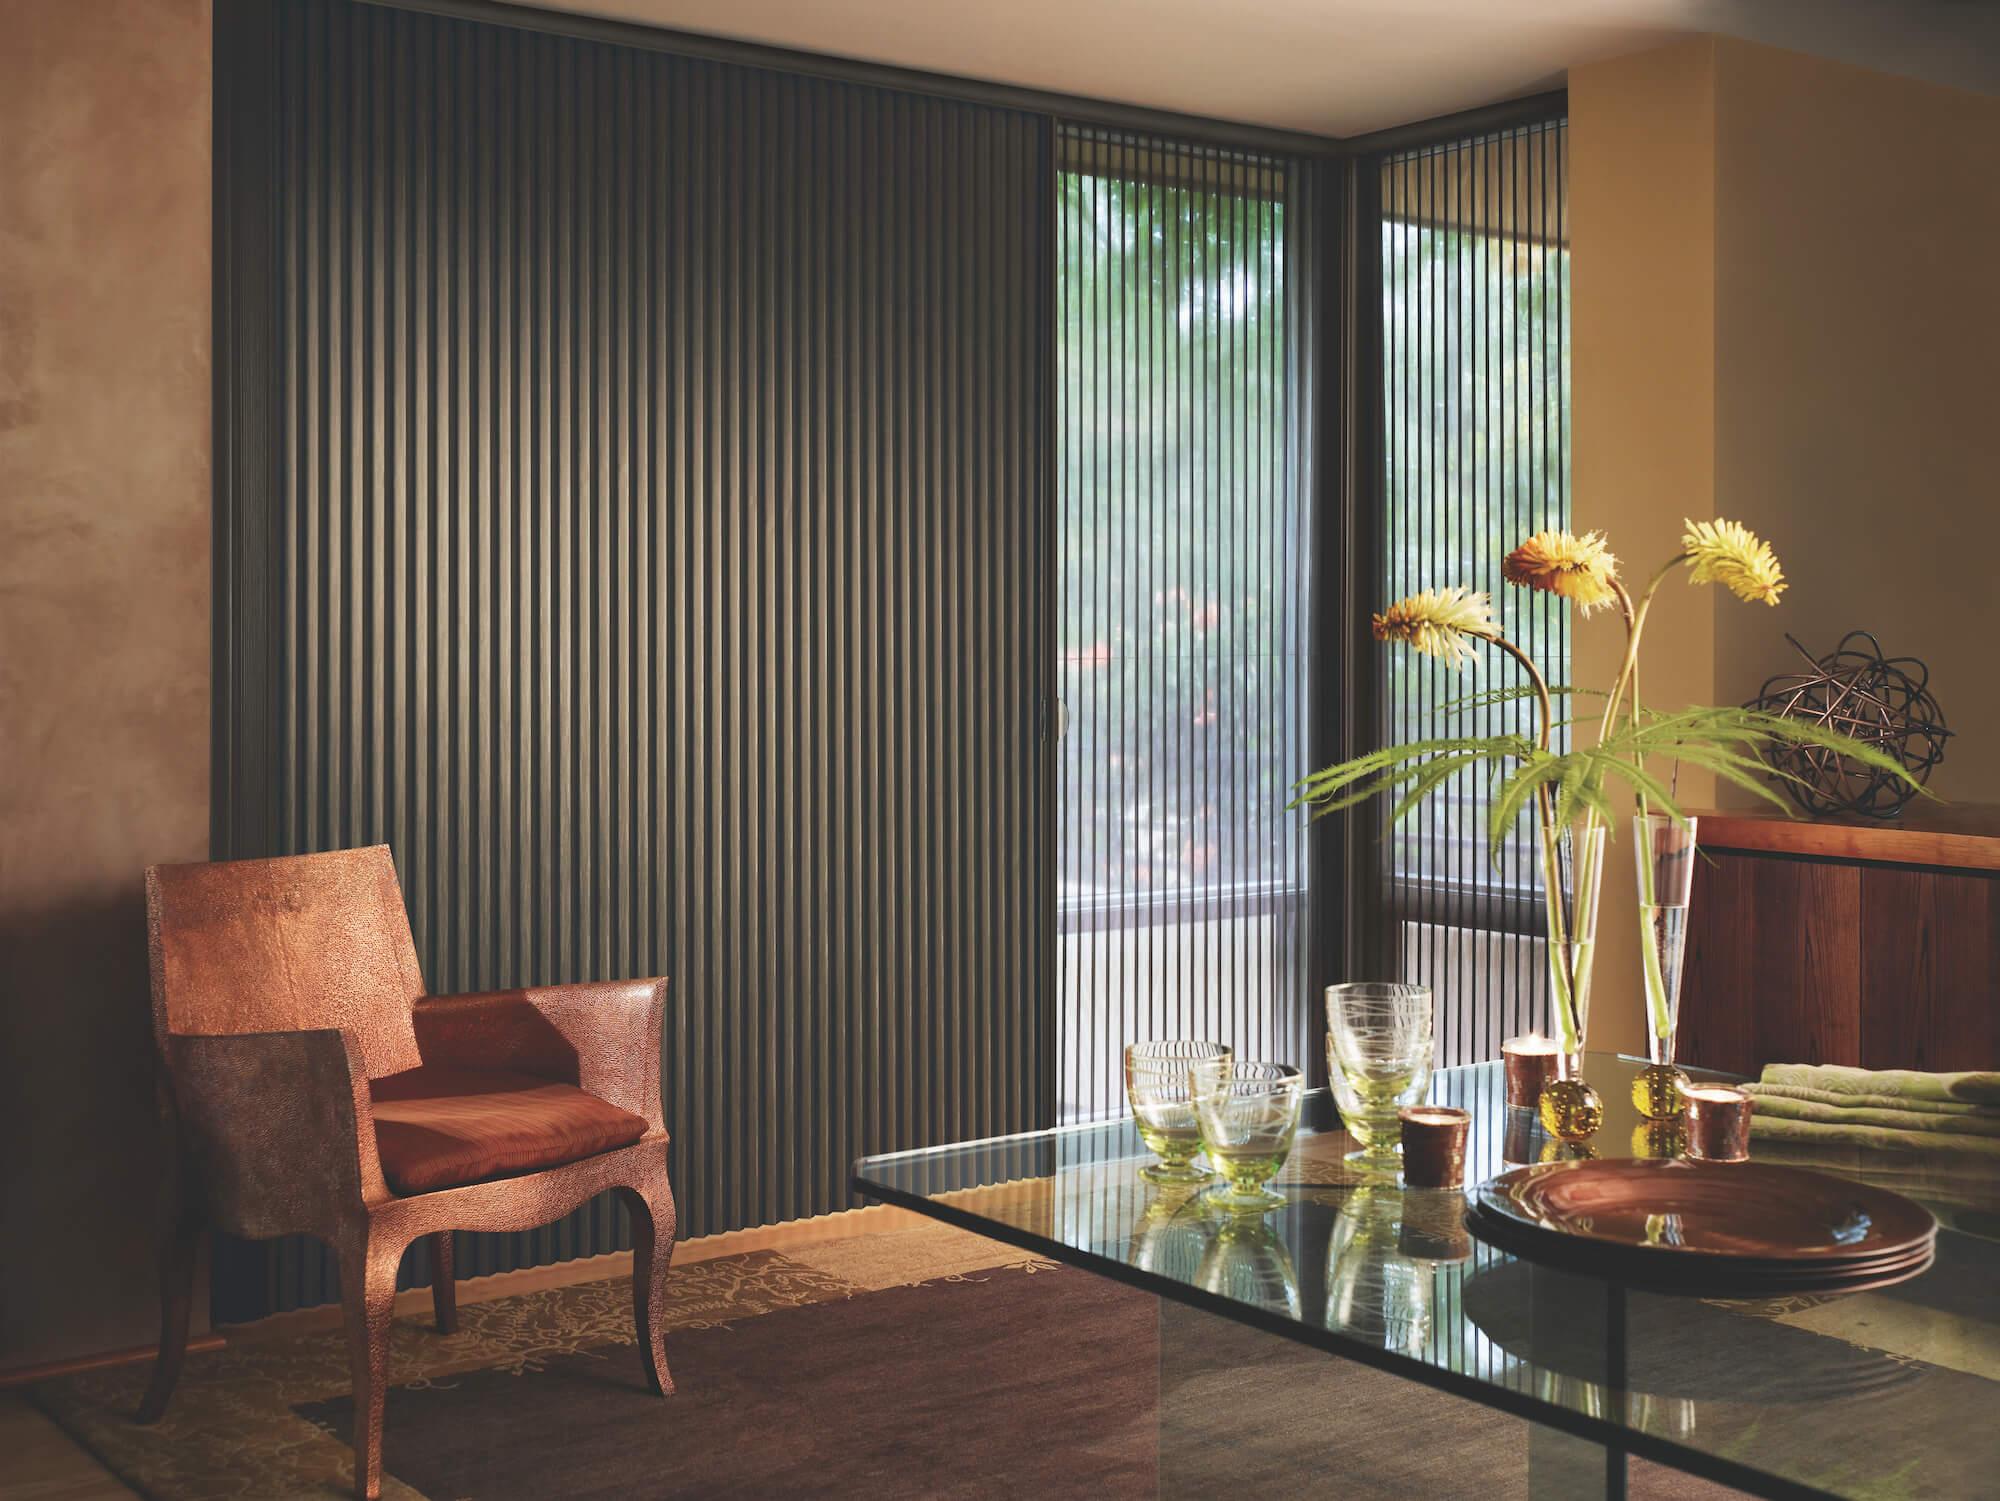 duette vertiglide shades on sliding glass door in dining room